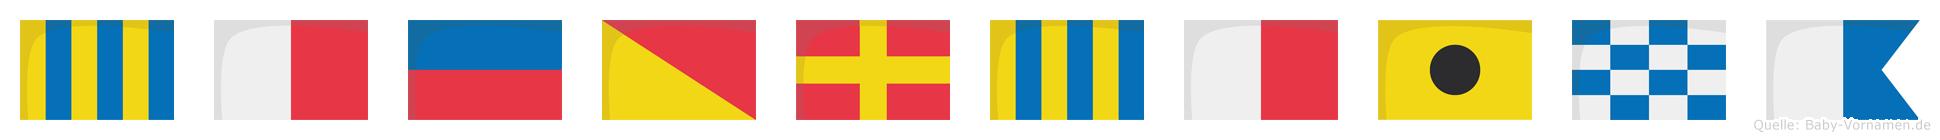 Gheorghina im Flaggenalphabet